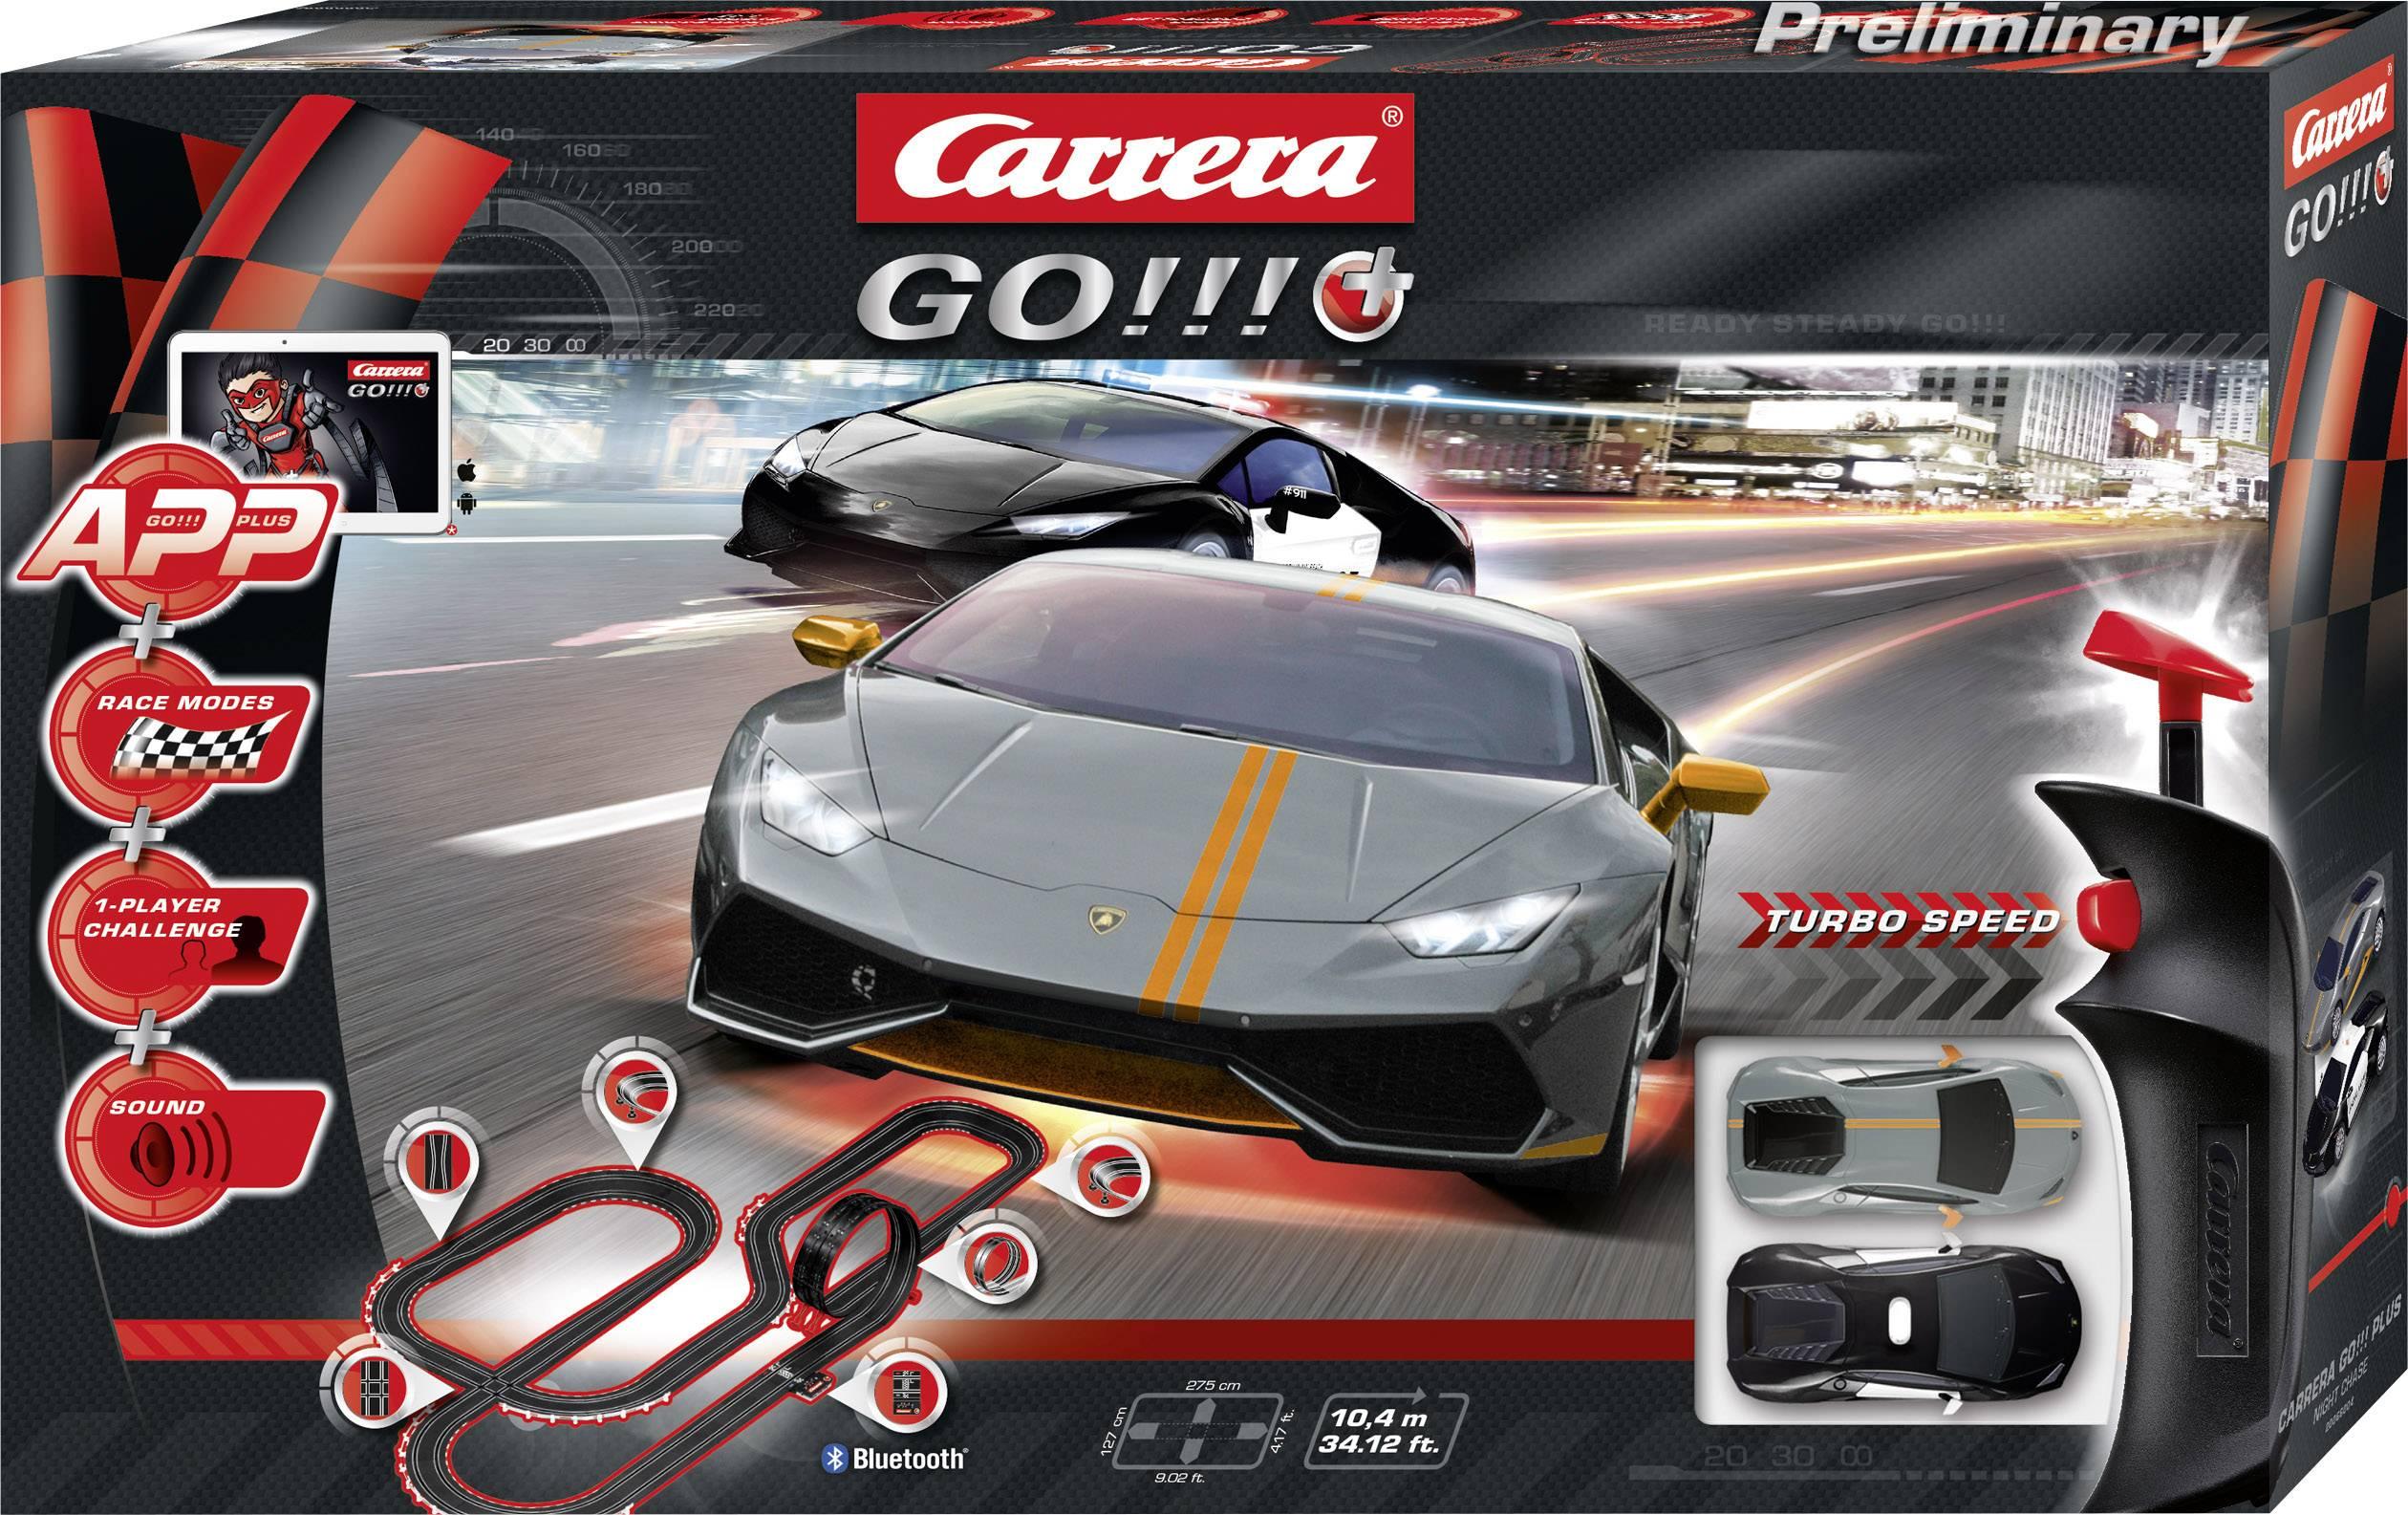 Autodráha, štartovacia sada Carrera Night Chase 20066004, druh autodráhy GO!!!